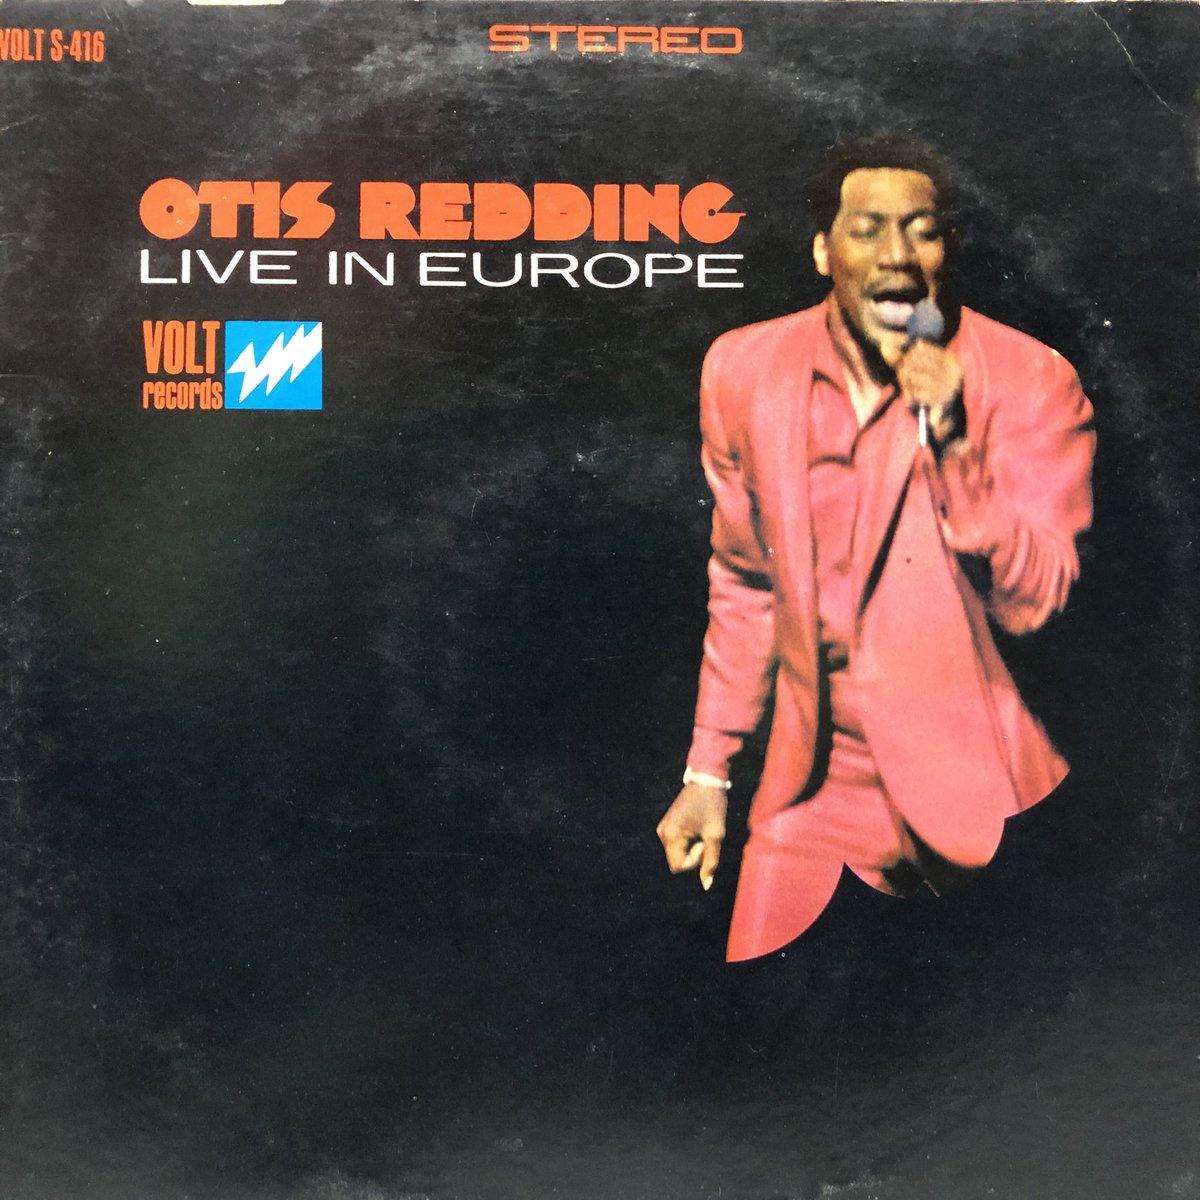 Otis Redding – Otis Redding Live In Europe  Volt – VOLT S-416, Volt – VOLT 416, Volt – S 416 LP,Terre Haute Pressing US盤 1967年 #otisredding   ガタガタ、ファファファファ言うとりまんがな